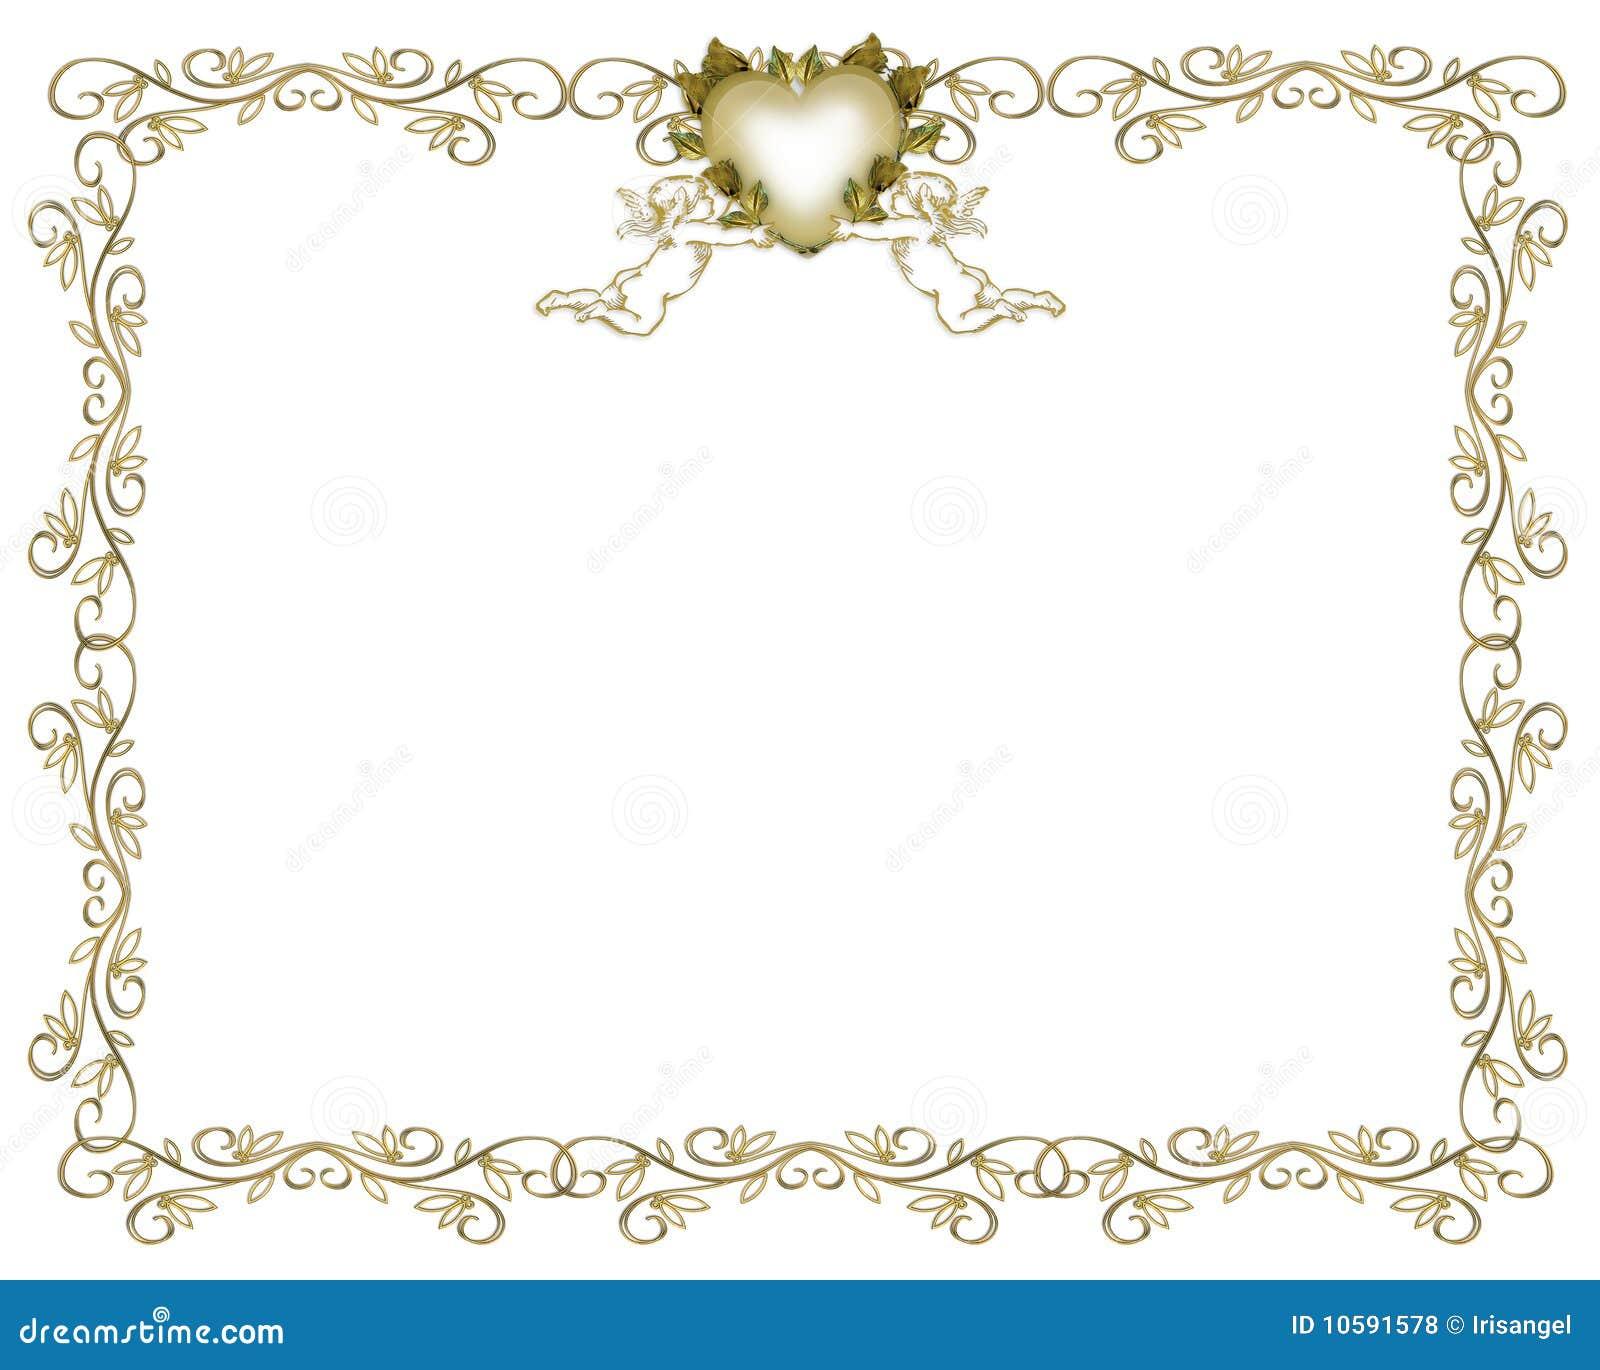 Wedding invitation gold border angels royalty free stock for Wedding invitation page borders free download